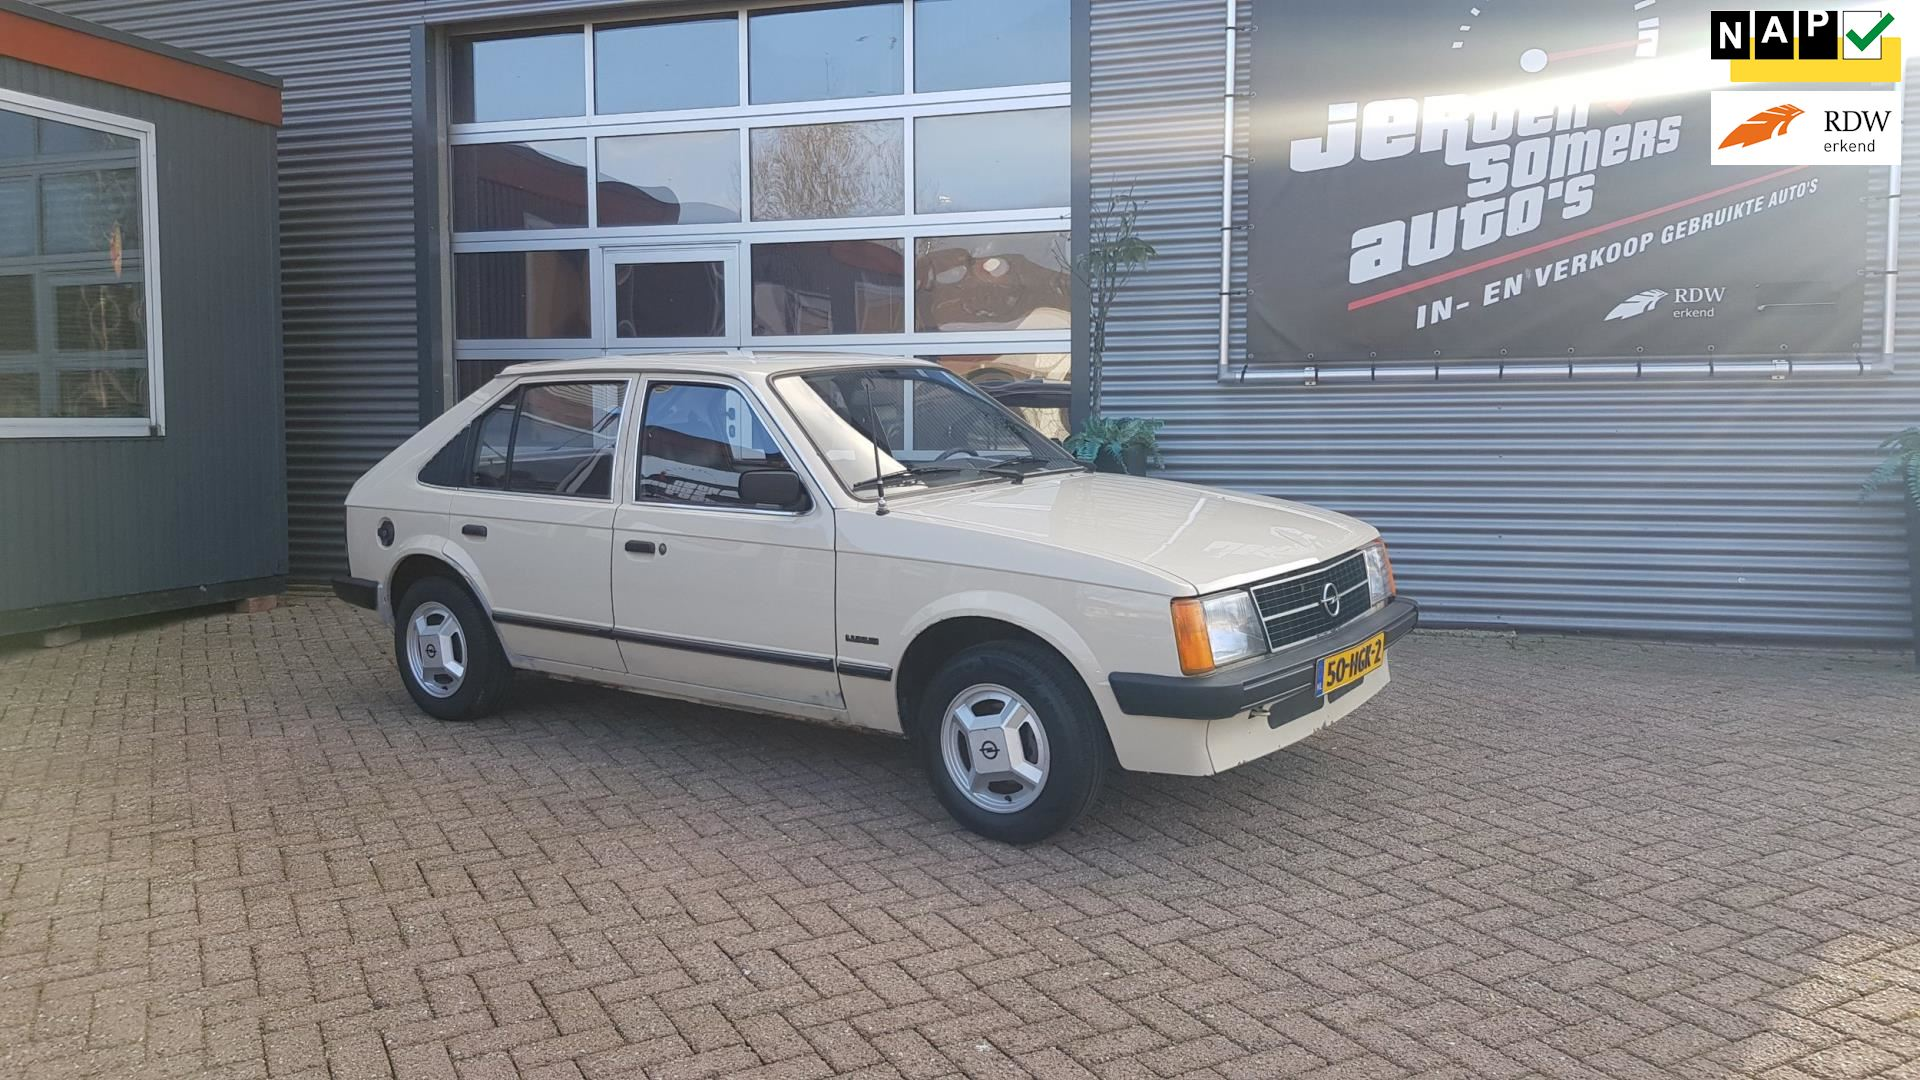 Opel KADETT HATCHBACK 1.6 SH  AUTOMATIC occasion - Jeroen Somers Auto´s